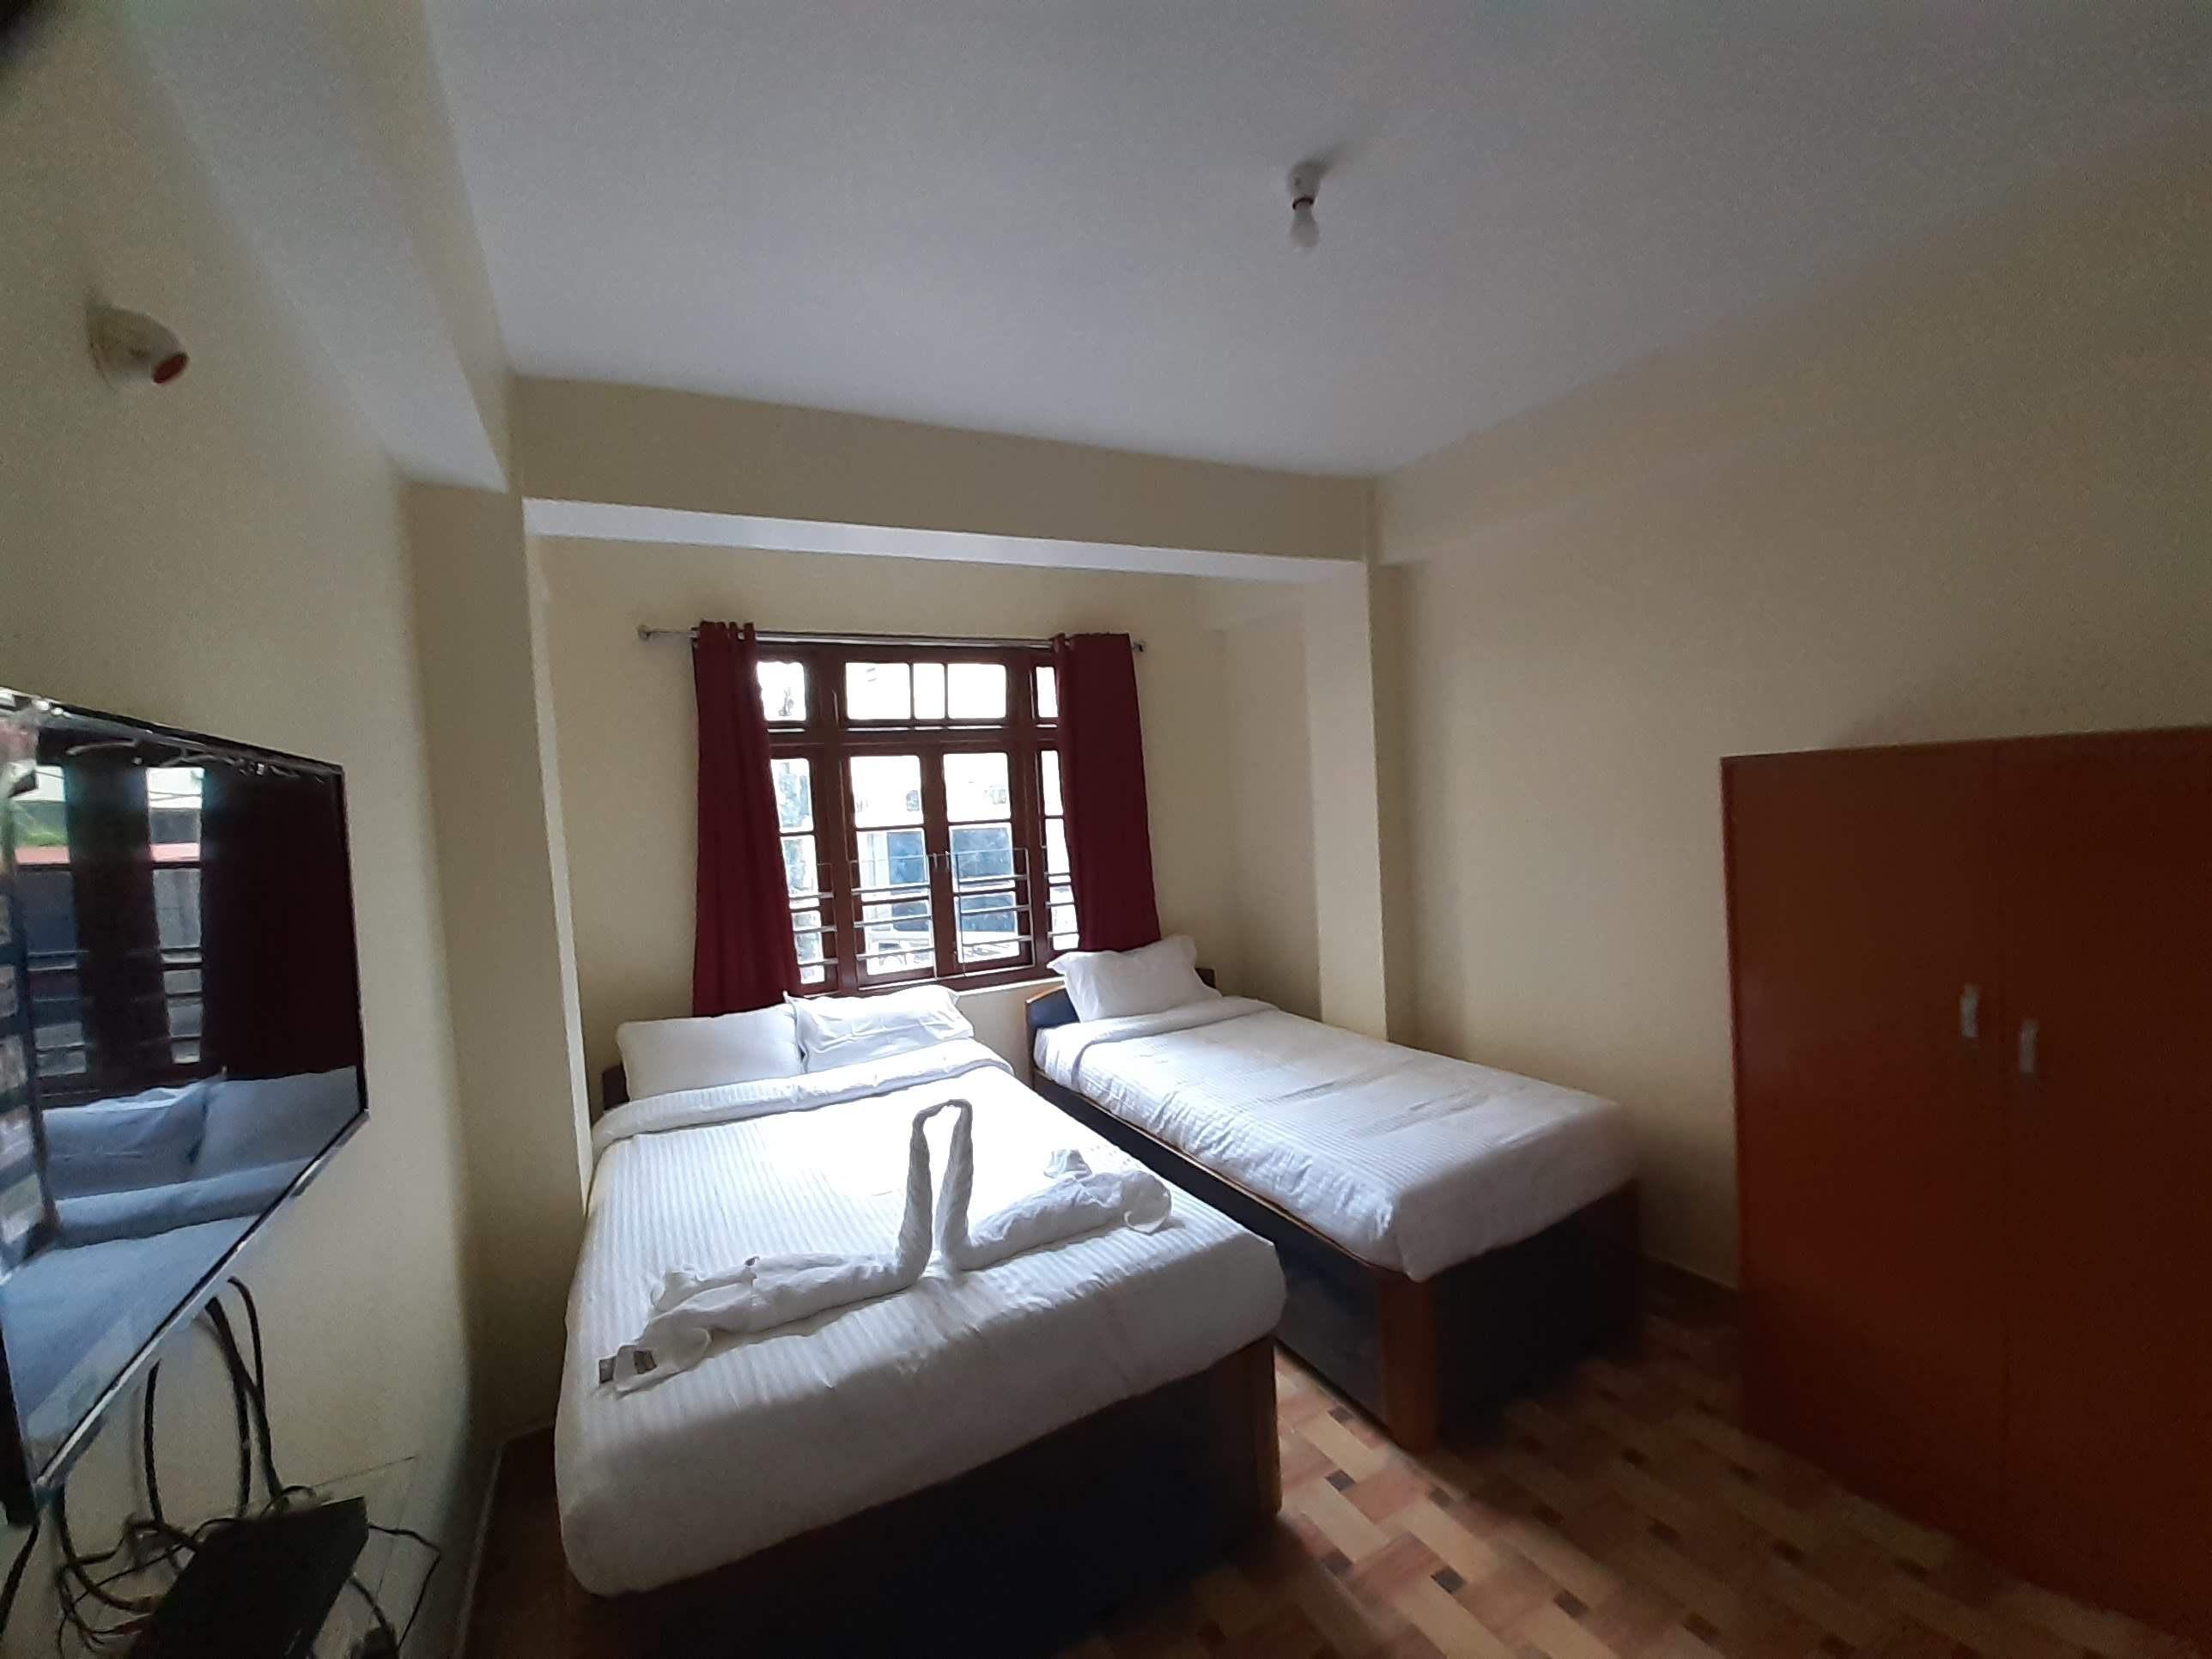 Venus Hotel - Arithang - Gangtok Image